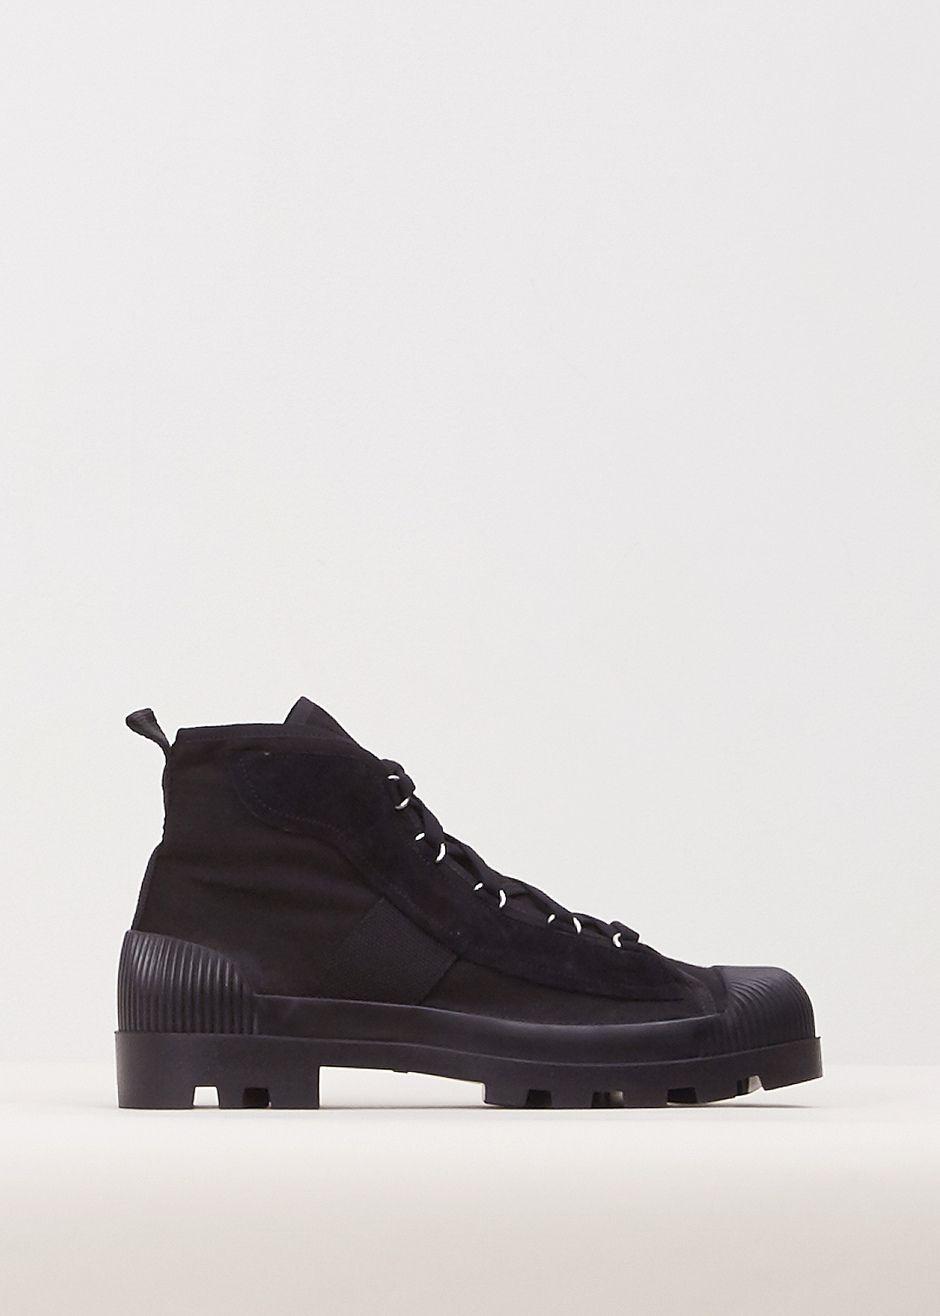 5dab1d2e2f0 Acne Studios Daniel Lace Up Boot (Black) | sportbaciai in 2019 ...